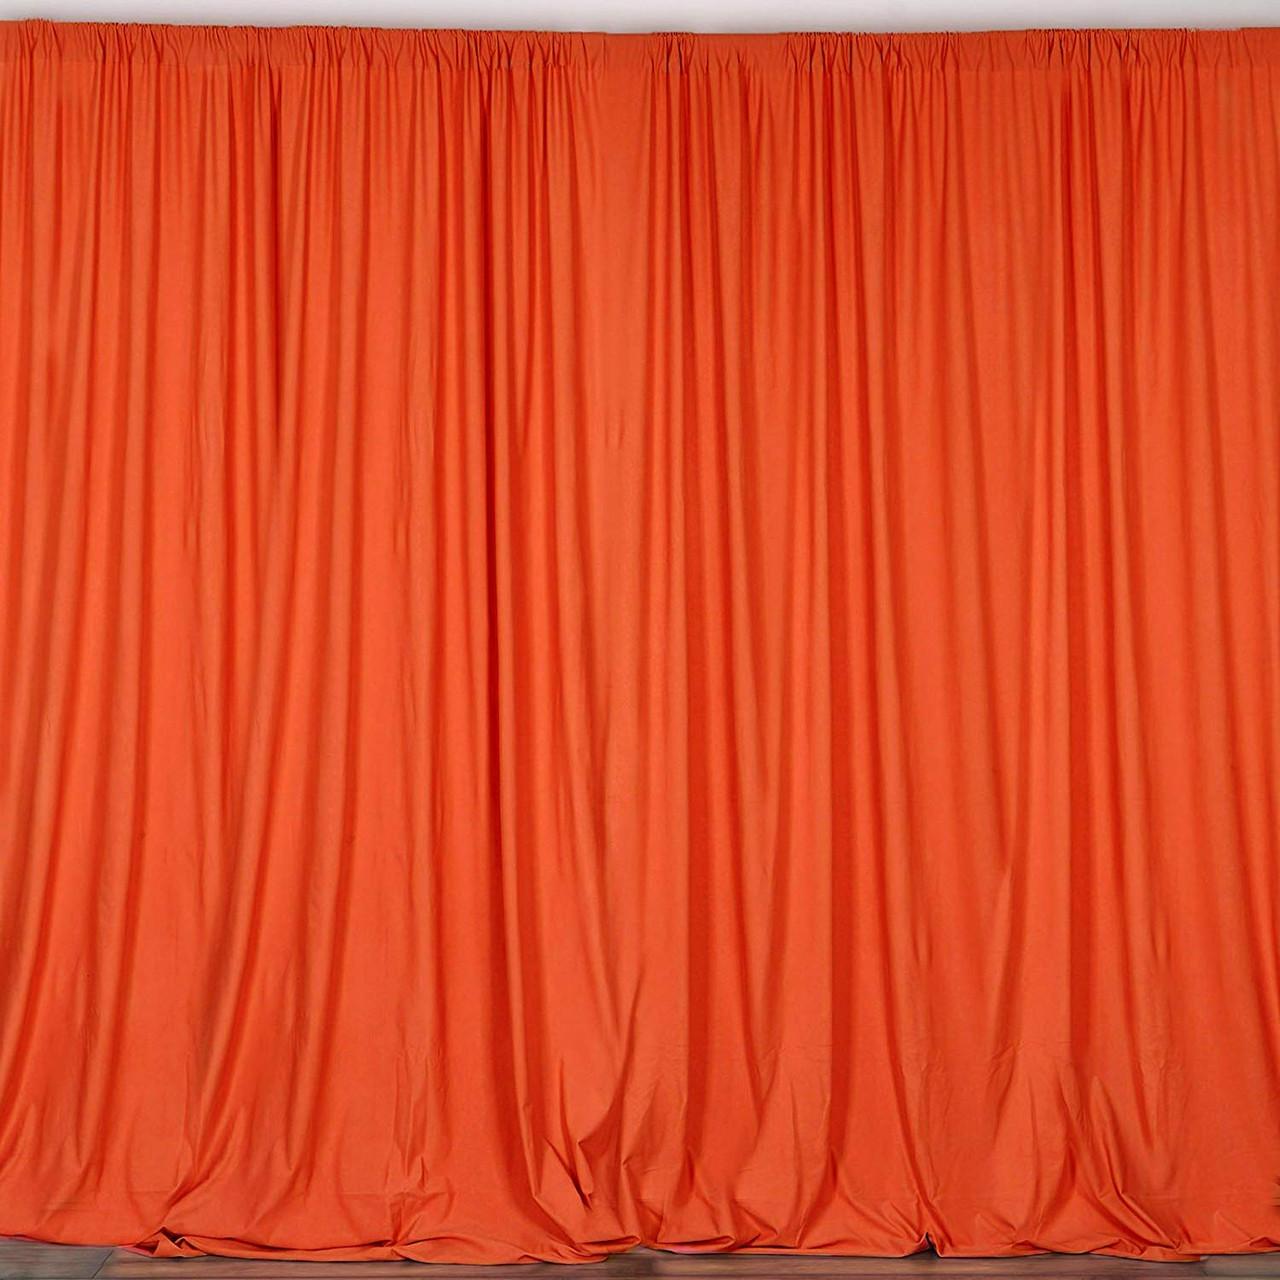 Cotton Curtain Panel Floral Bandanna Print Pink  Window Decor  Window Treatments  Backdrop